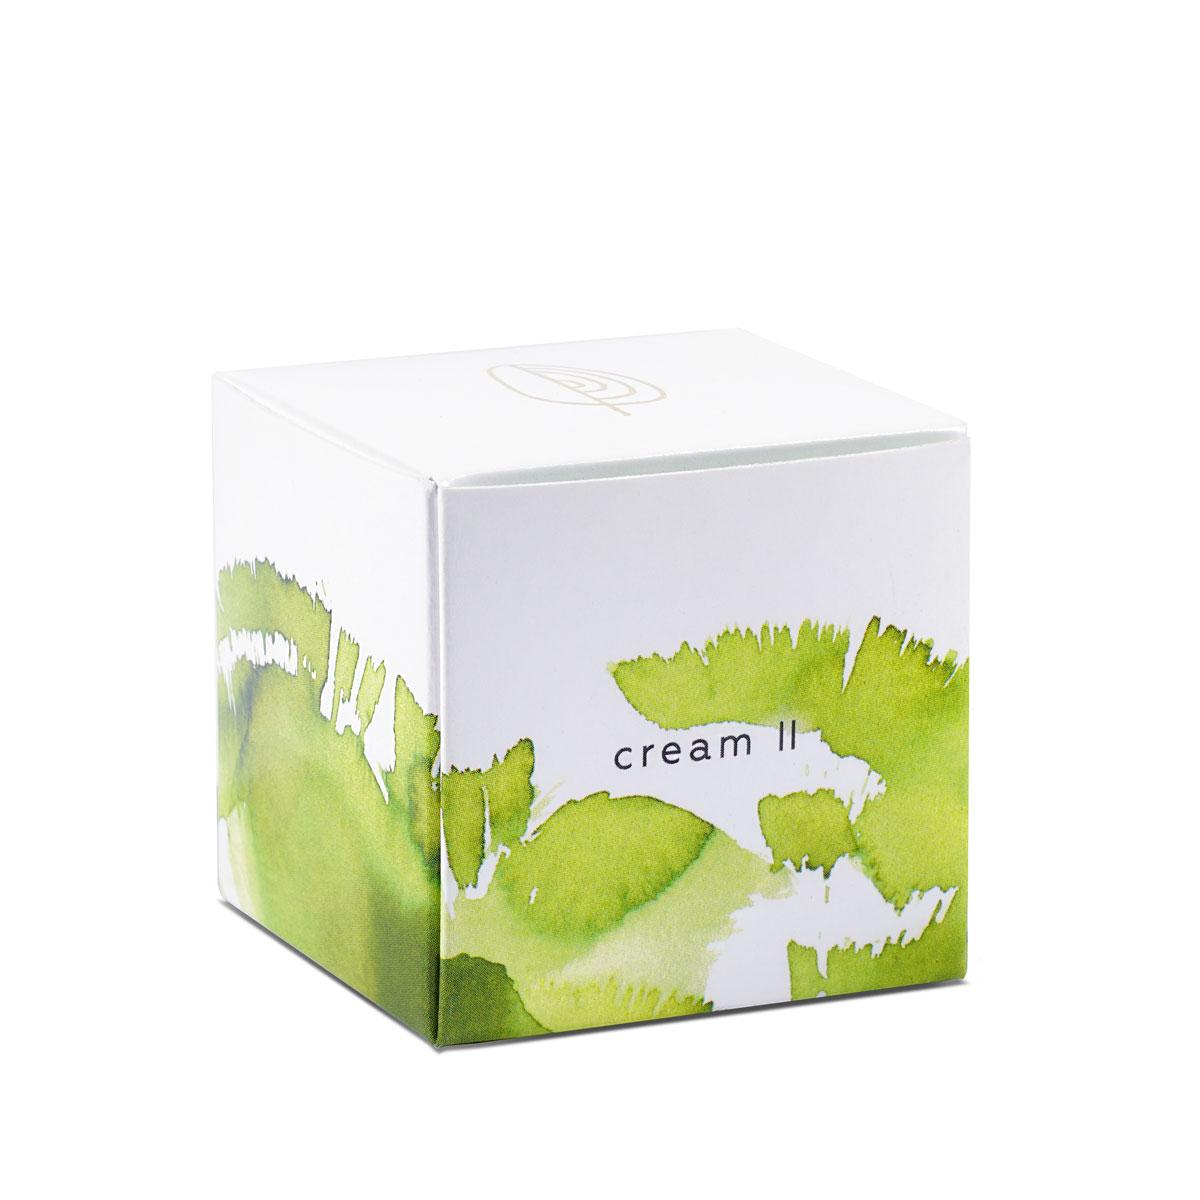 petit-collection-web-cream-II